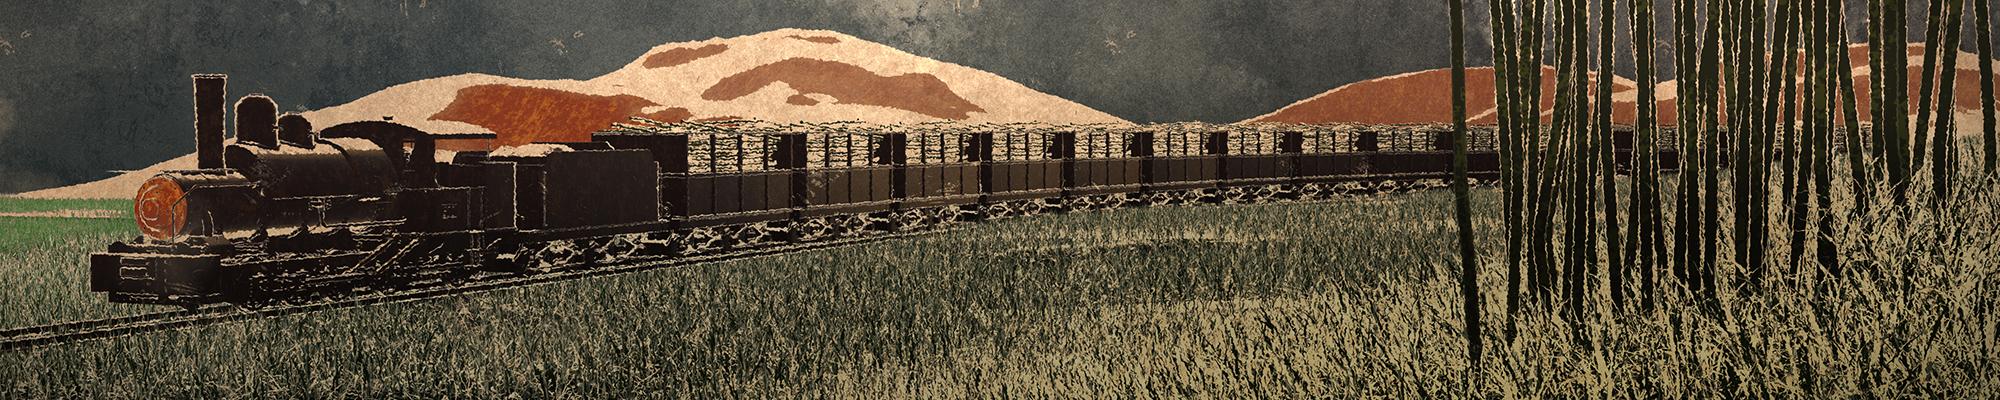 Trainscene 1